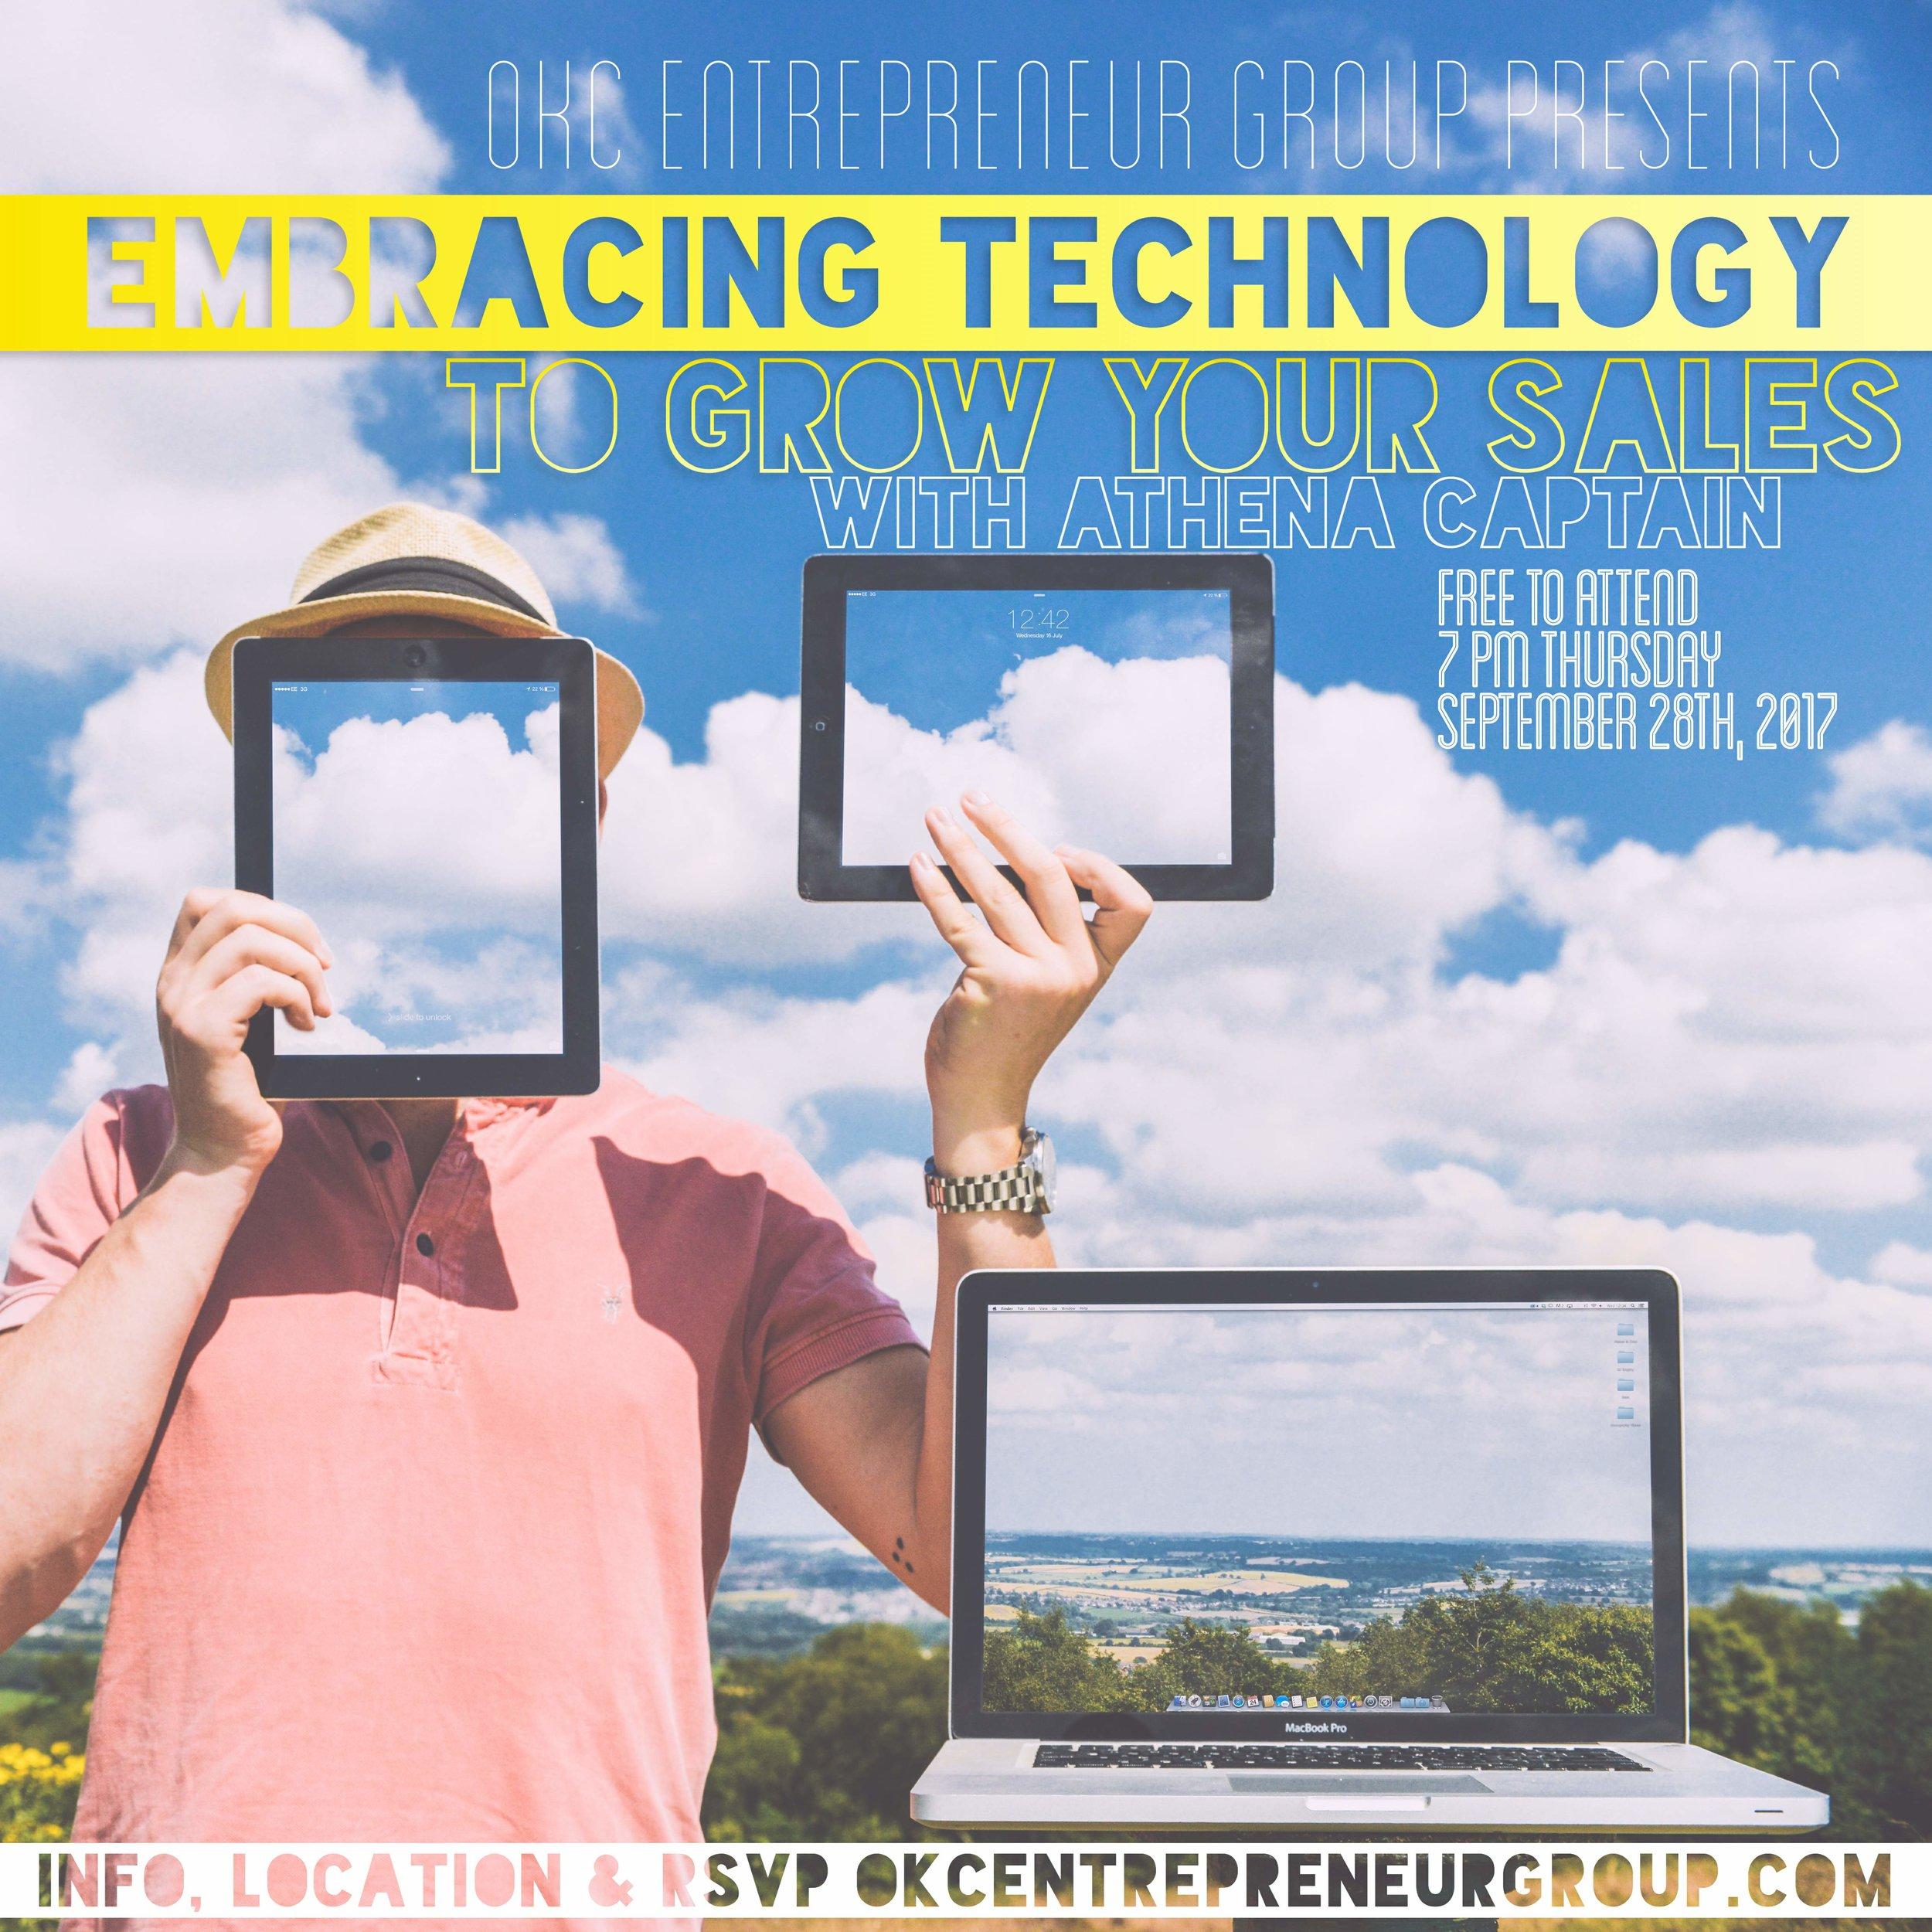 OKCEG Embracing Technology with Athena Captain SM.jpg